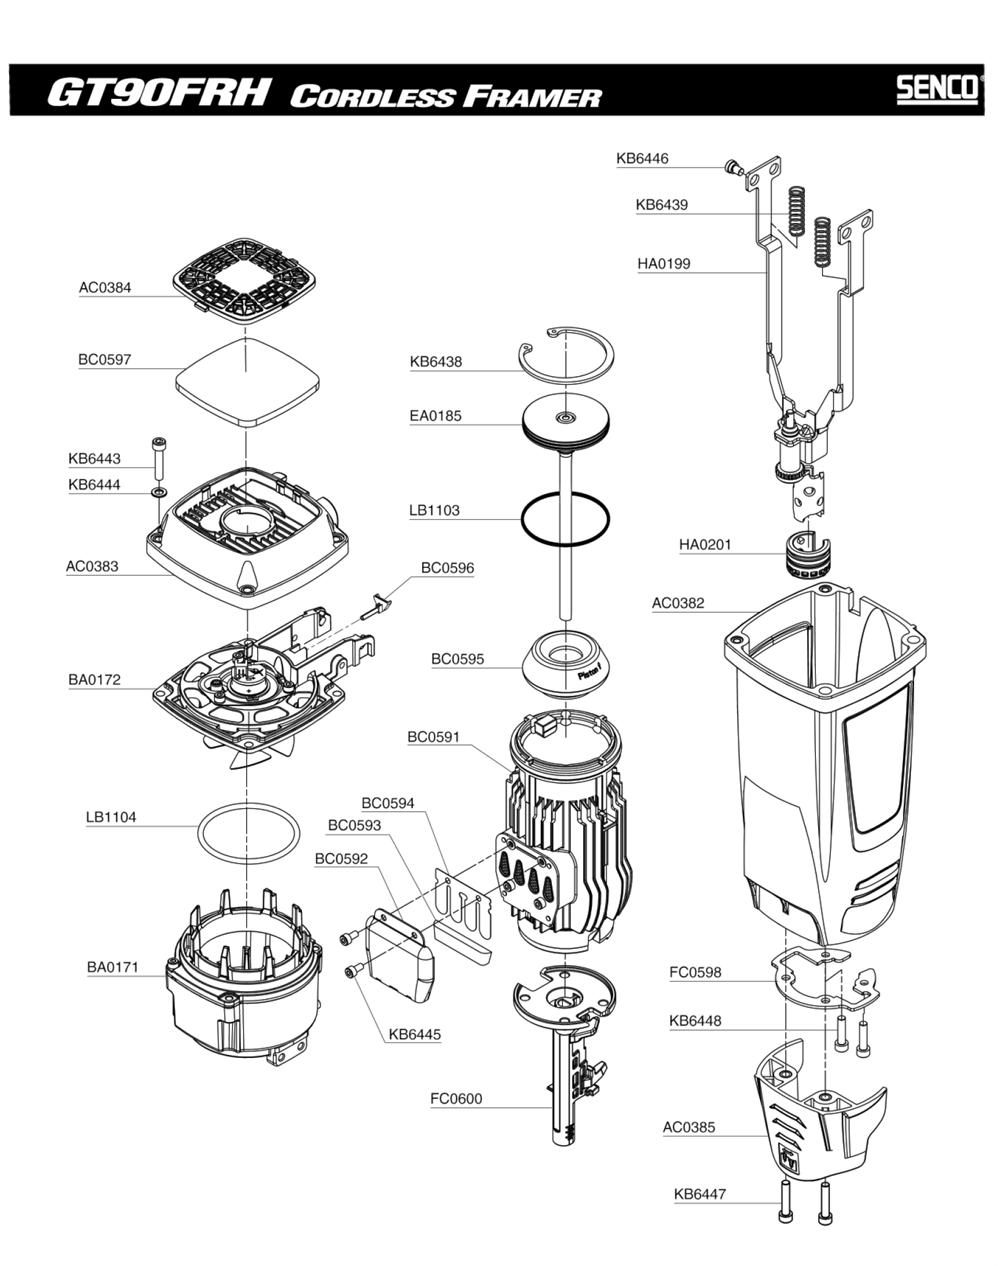 Senco BA0171 Combustion Chamber